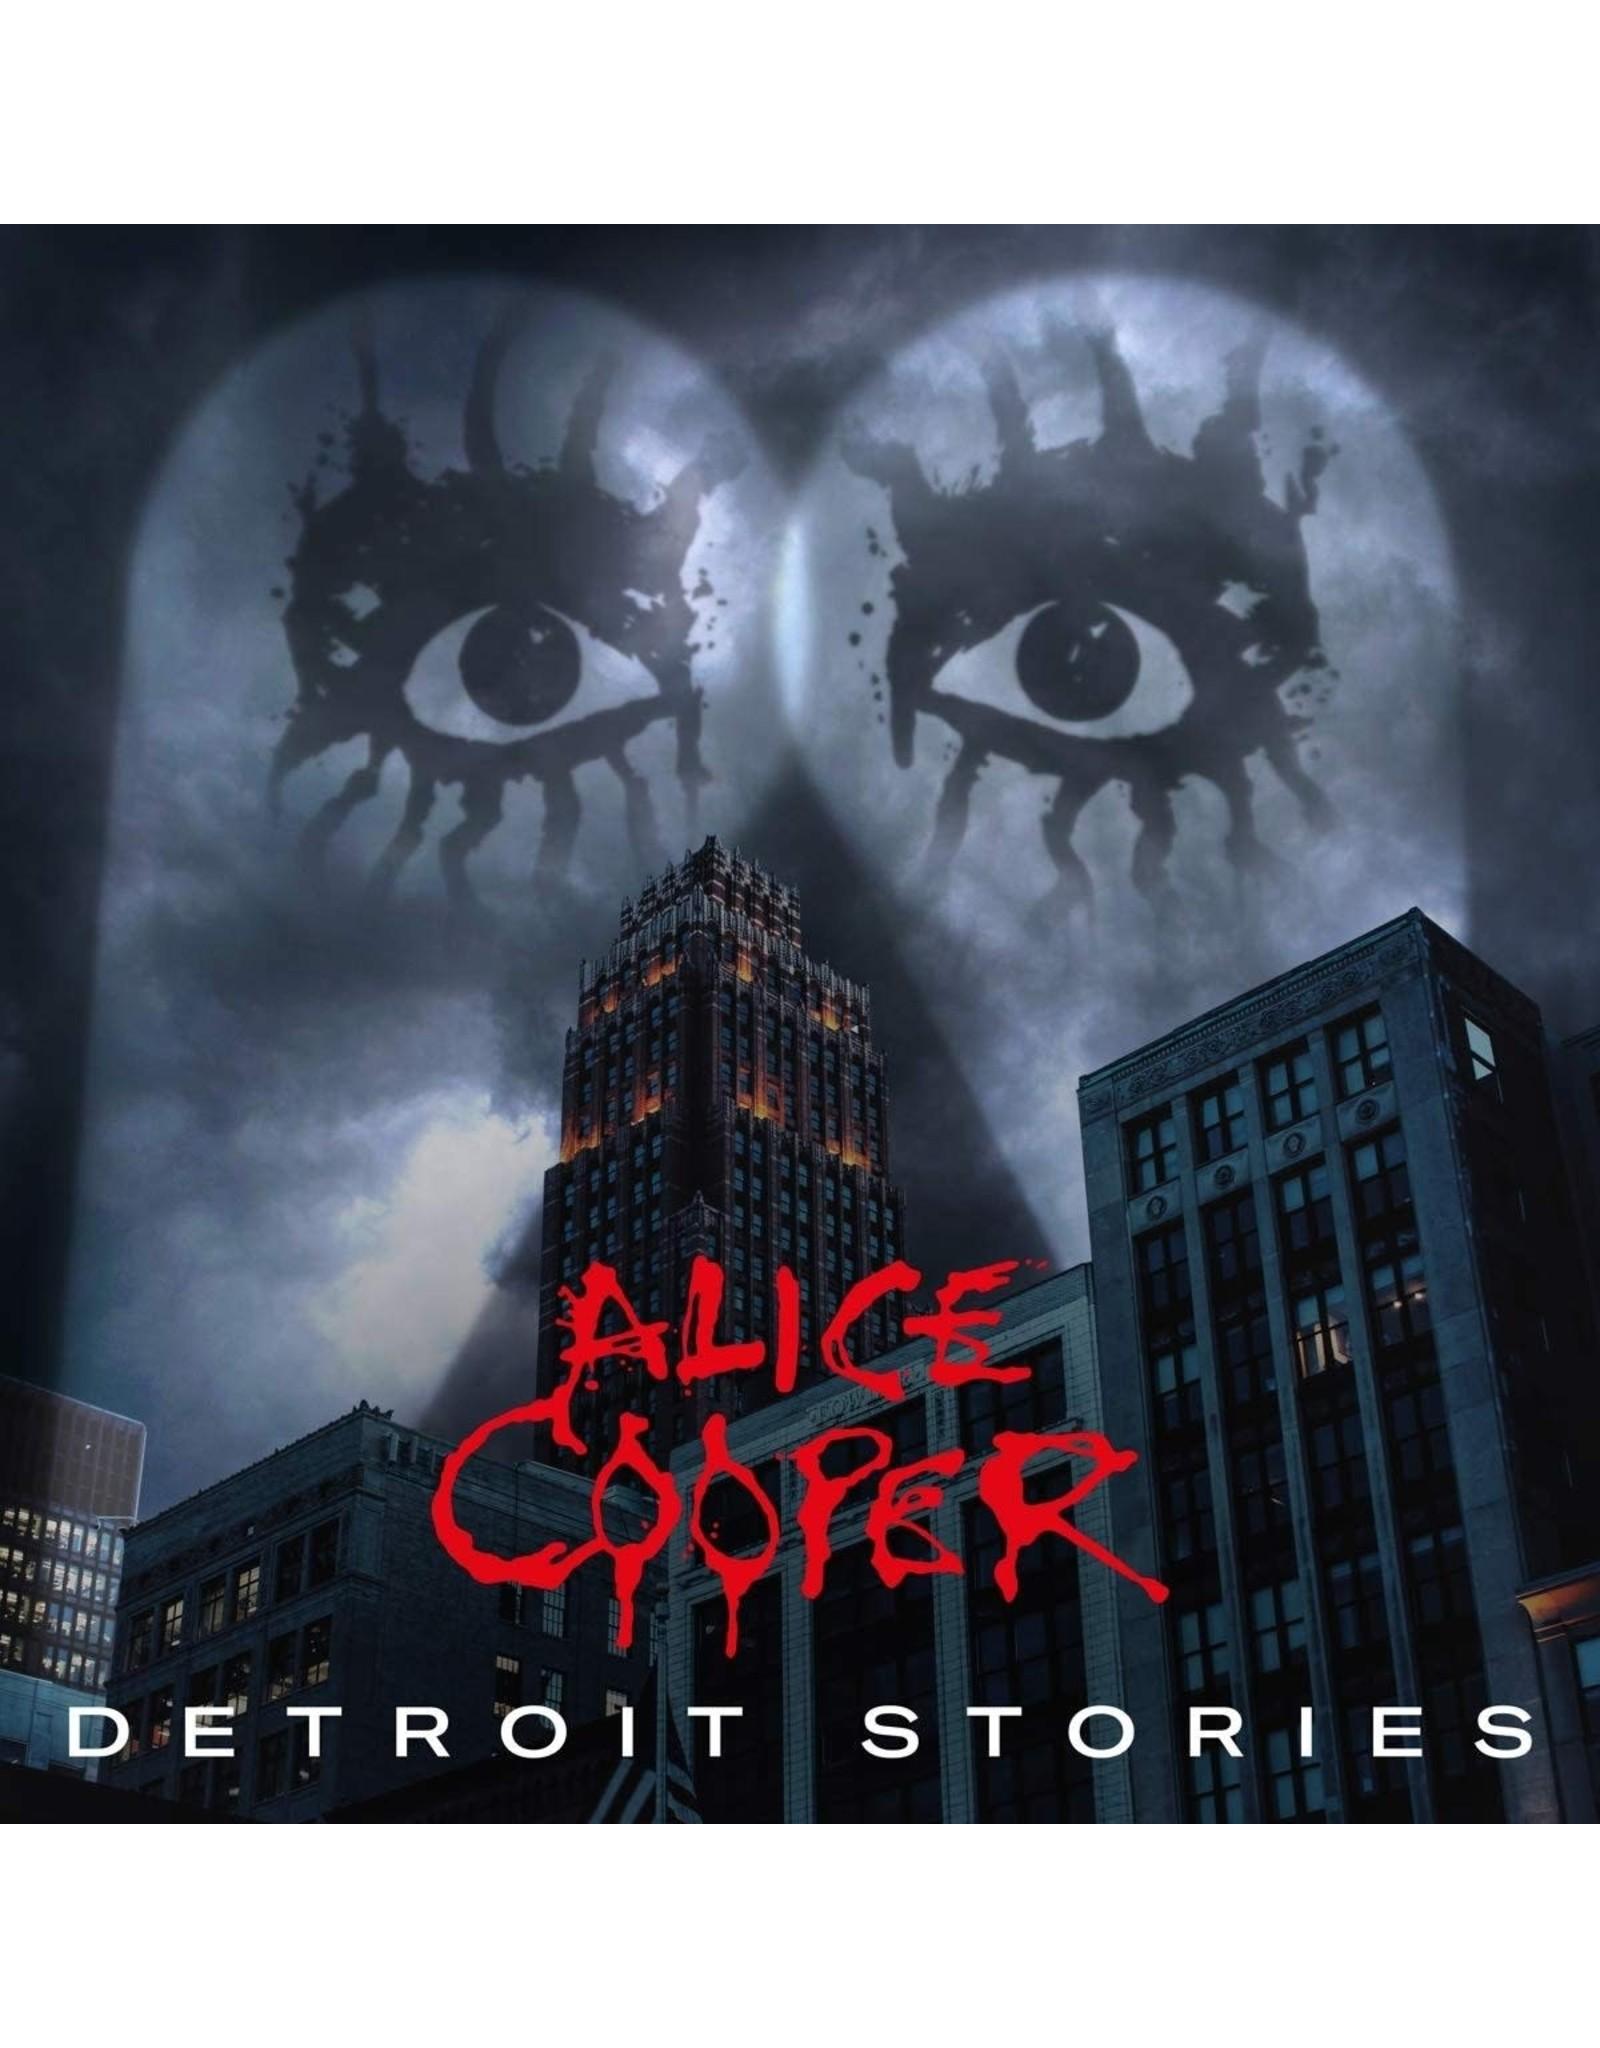 Cooper, Alice - Detroit Stories 2LP